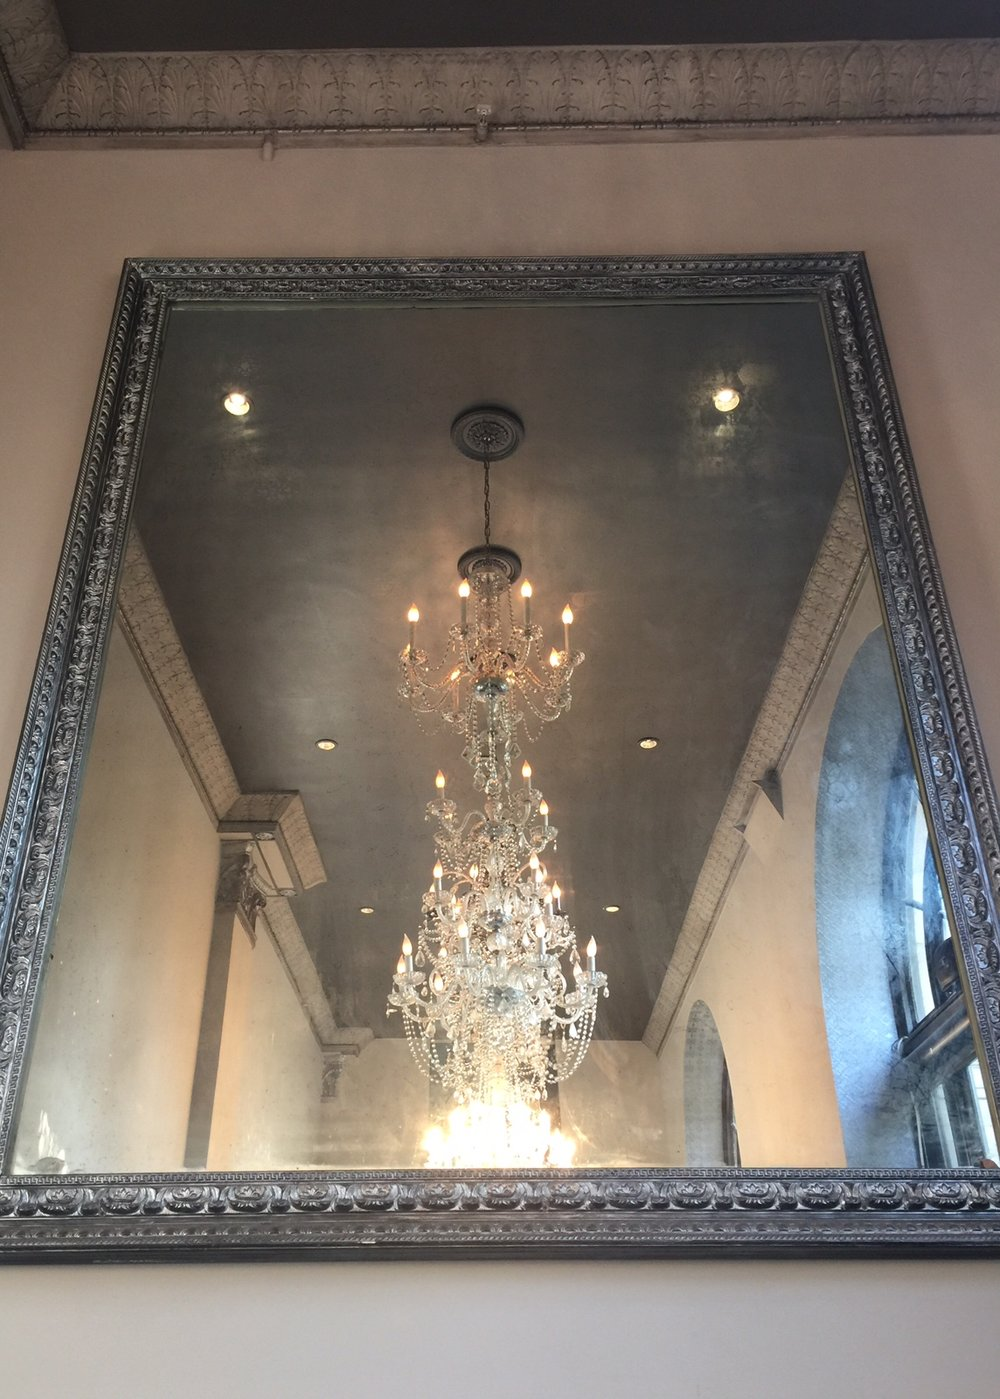 Antique mirror with chandeliers - The Culver Hotel, Los Angeles